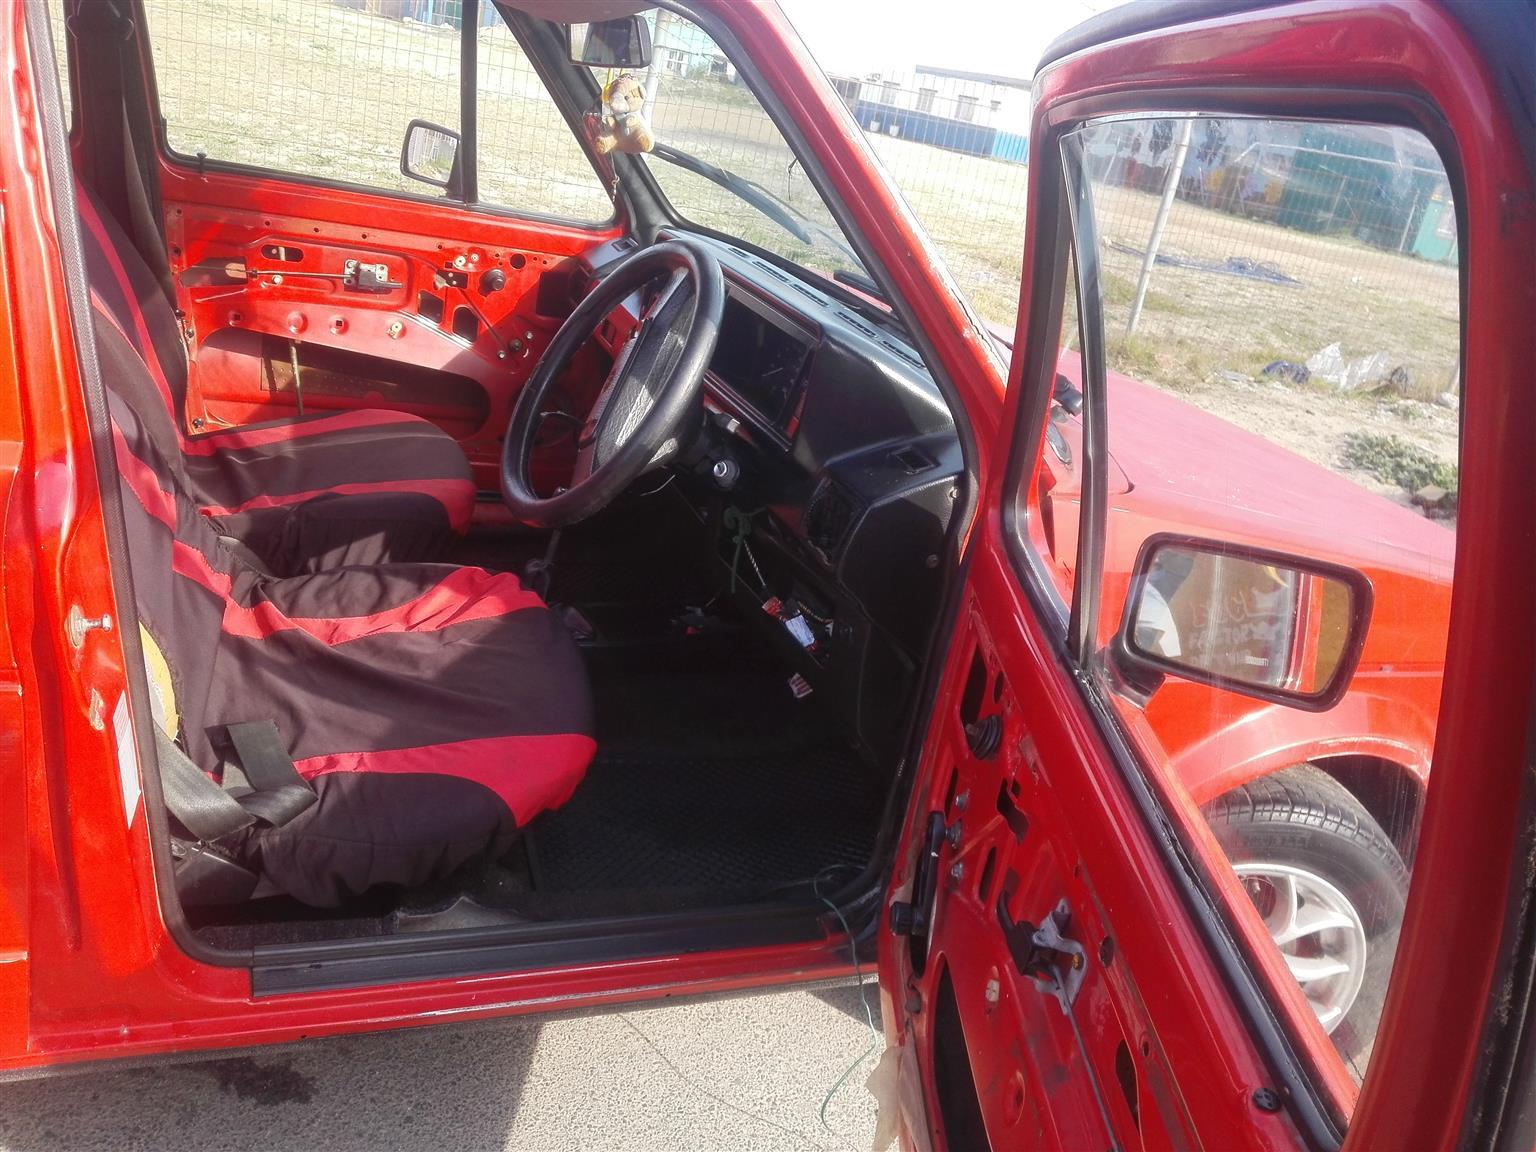 1992 VW Citi CITI 1.4i